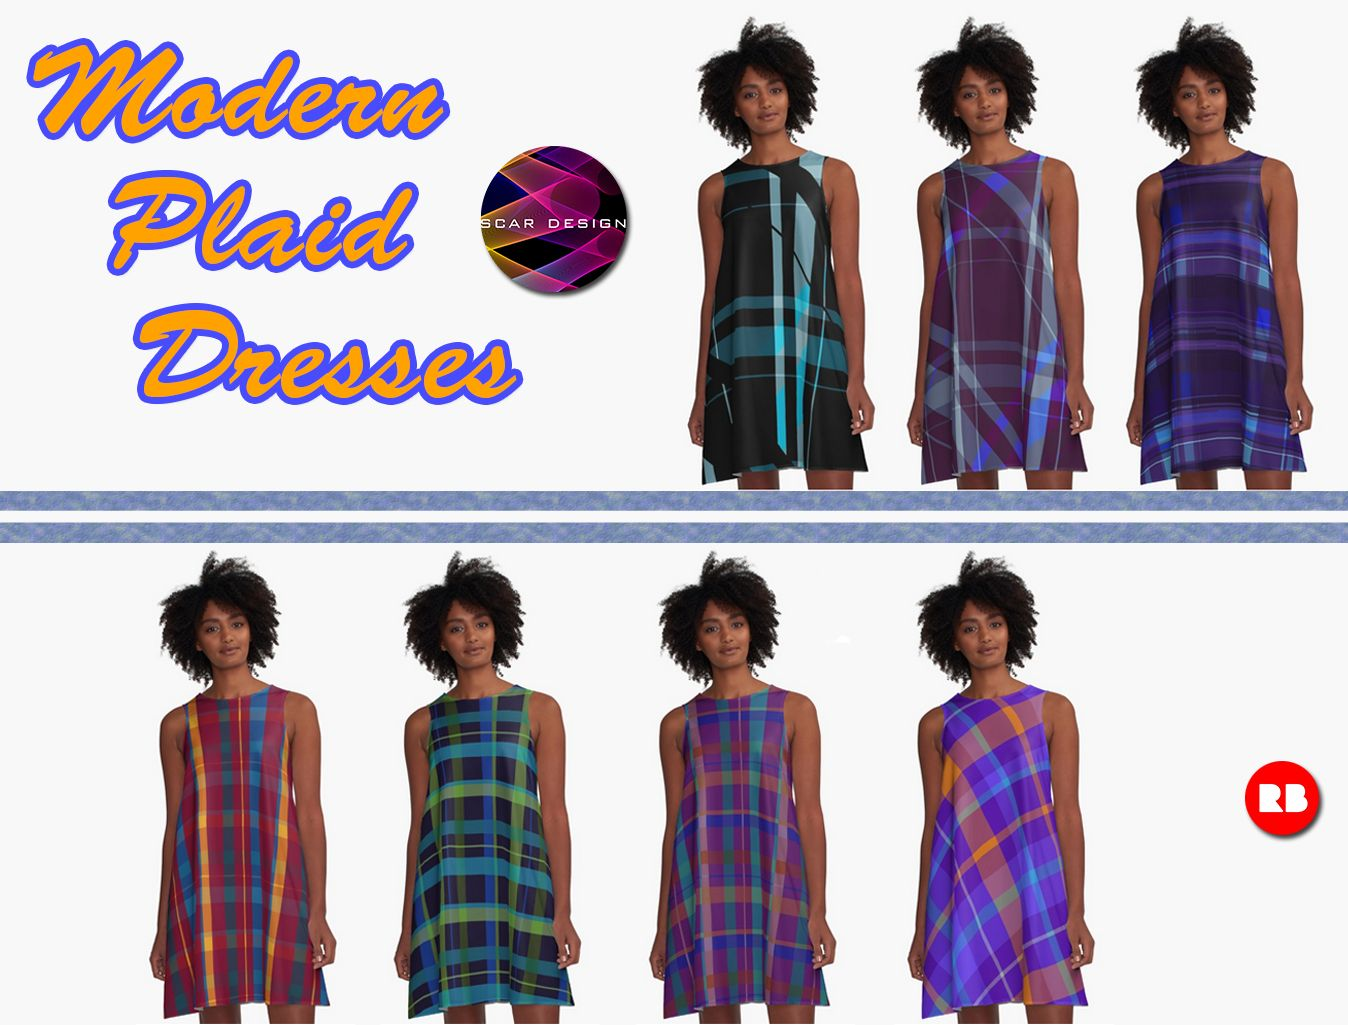 Modern Plaid Dresses by Scar Design  #modern #dress #dresses #moderndress #scardesign #gifts #clothing #buymoderndress #pattern #patterndress #cooldresses #springdress #summerdress #modernspringdress #modernsummerdress #fashion #women #giftsforher #womensfashion #fashiongifts #colorful #style #redbubble #onlineshopping #dots #plaid #buyplaiddress #plaidgifts #plaiddress